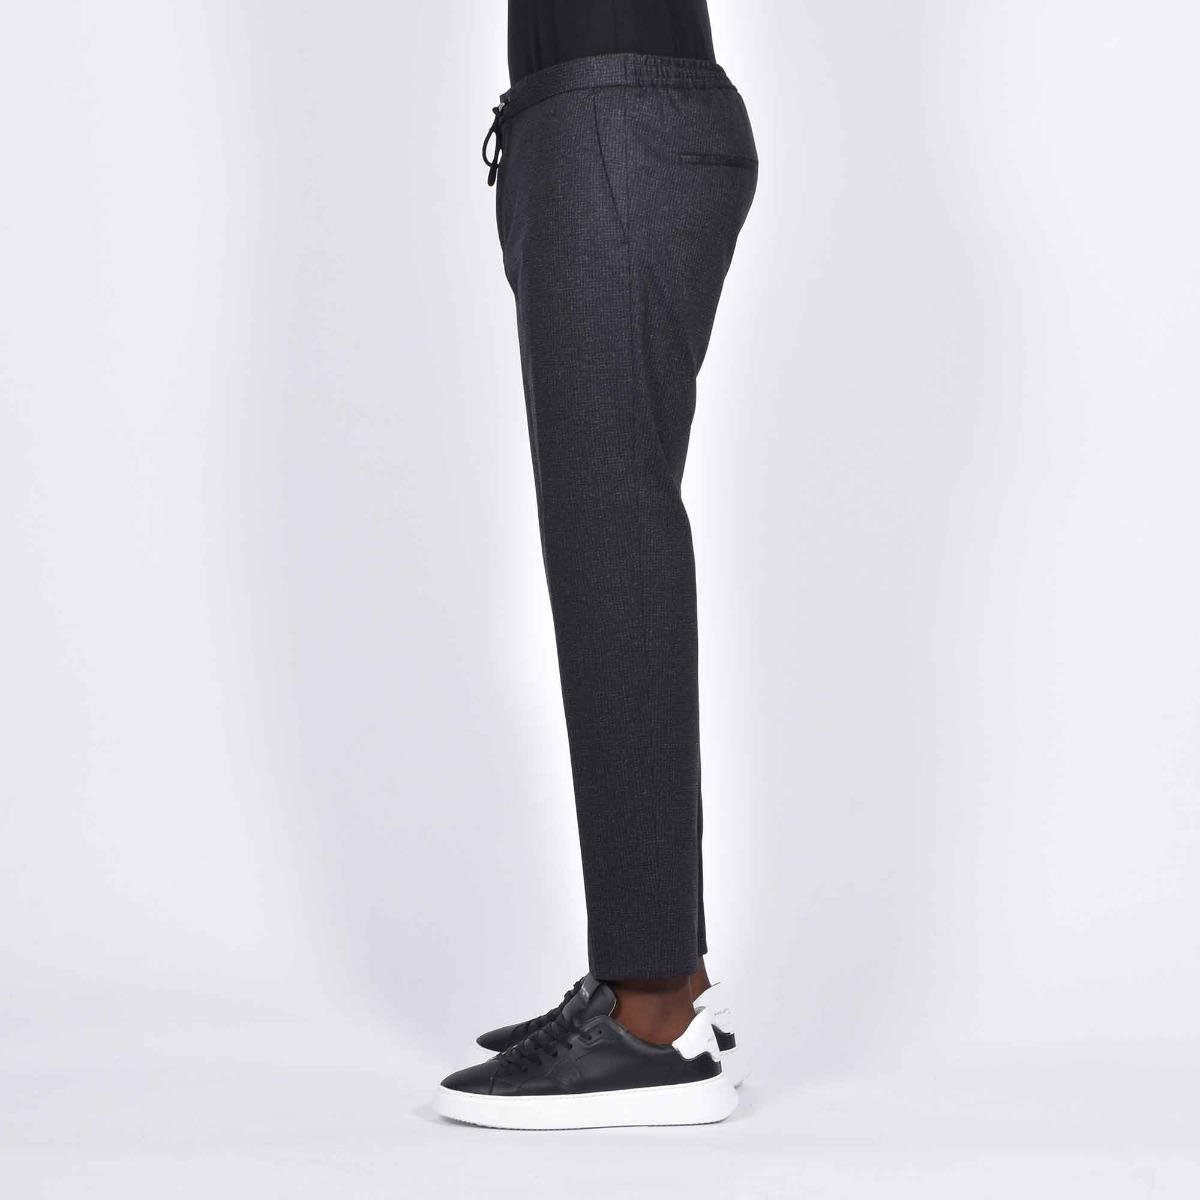 Pantalone banks slim - Grigio